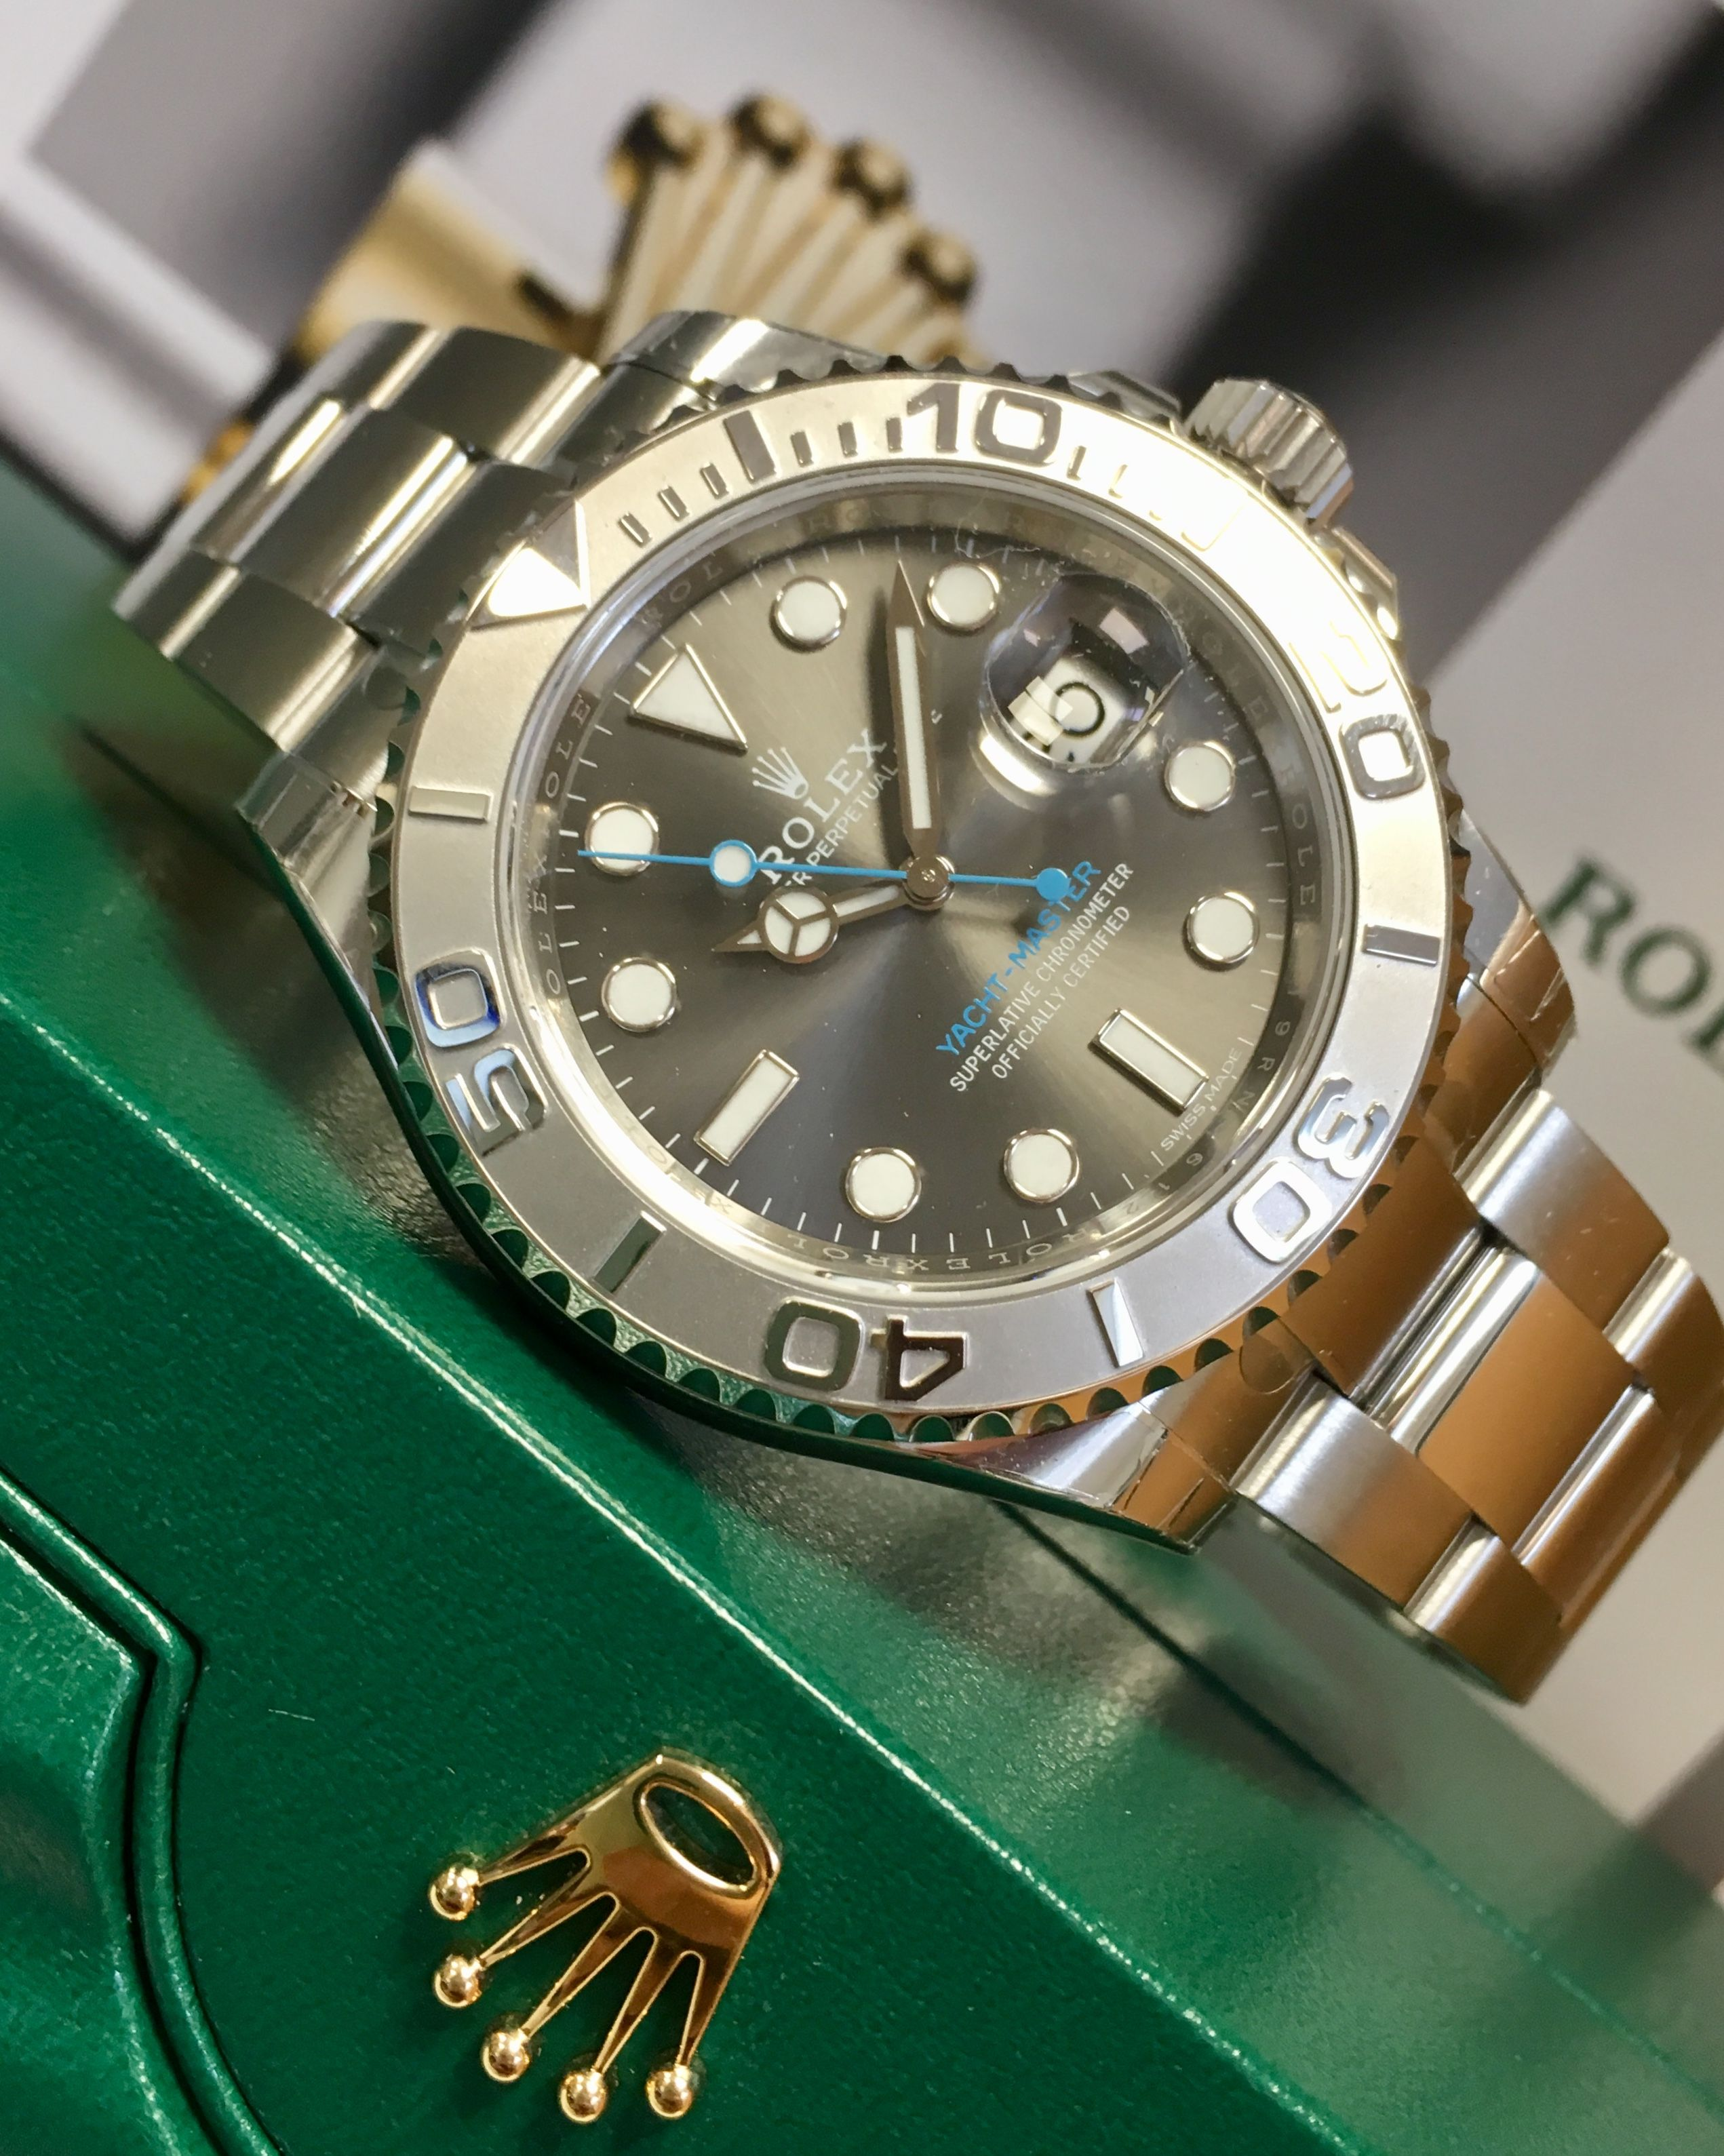 9199ae37038 Rolex Yacht-Master Rhodium Dial 116622